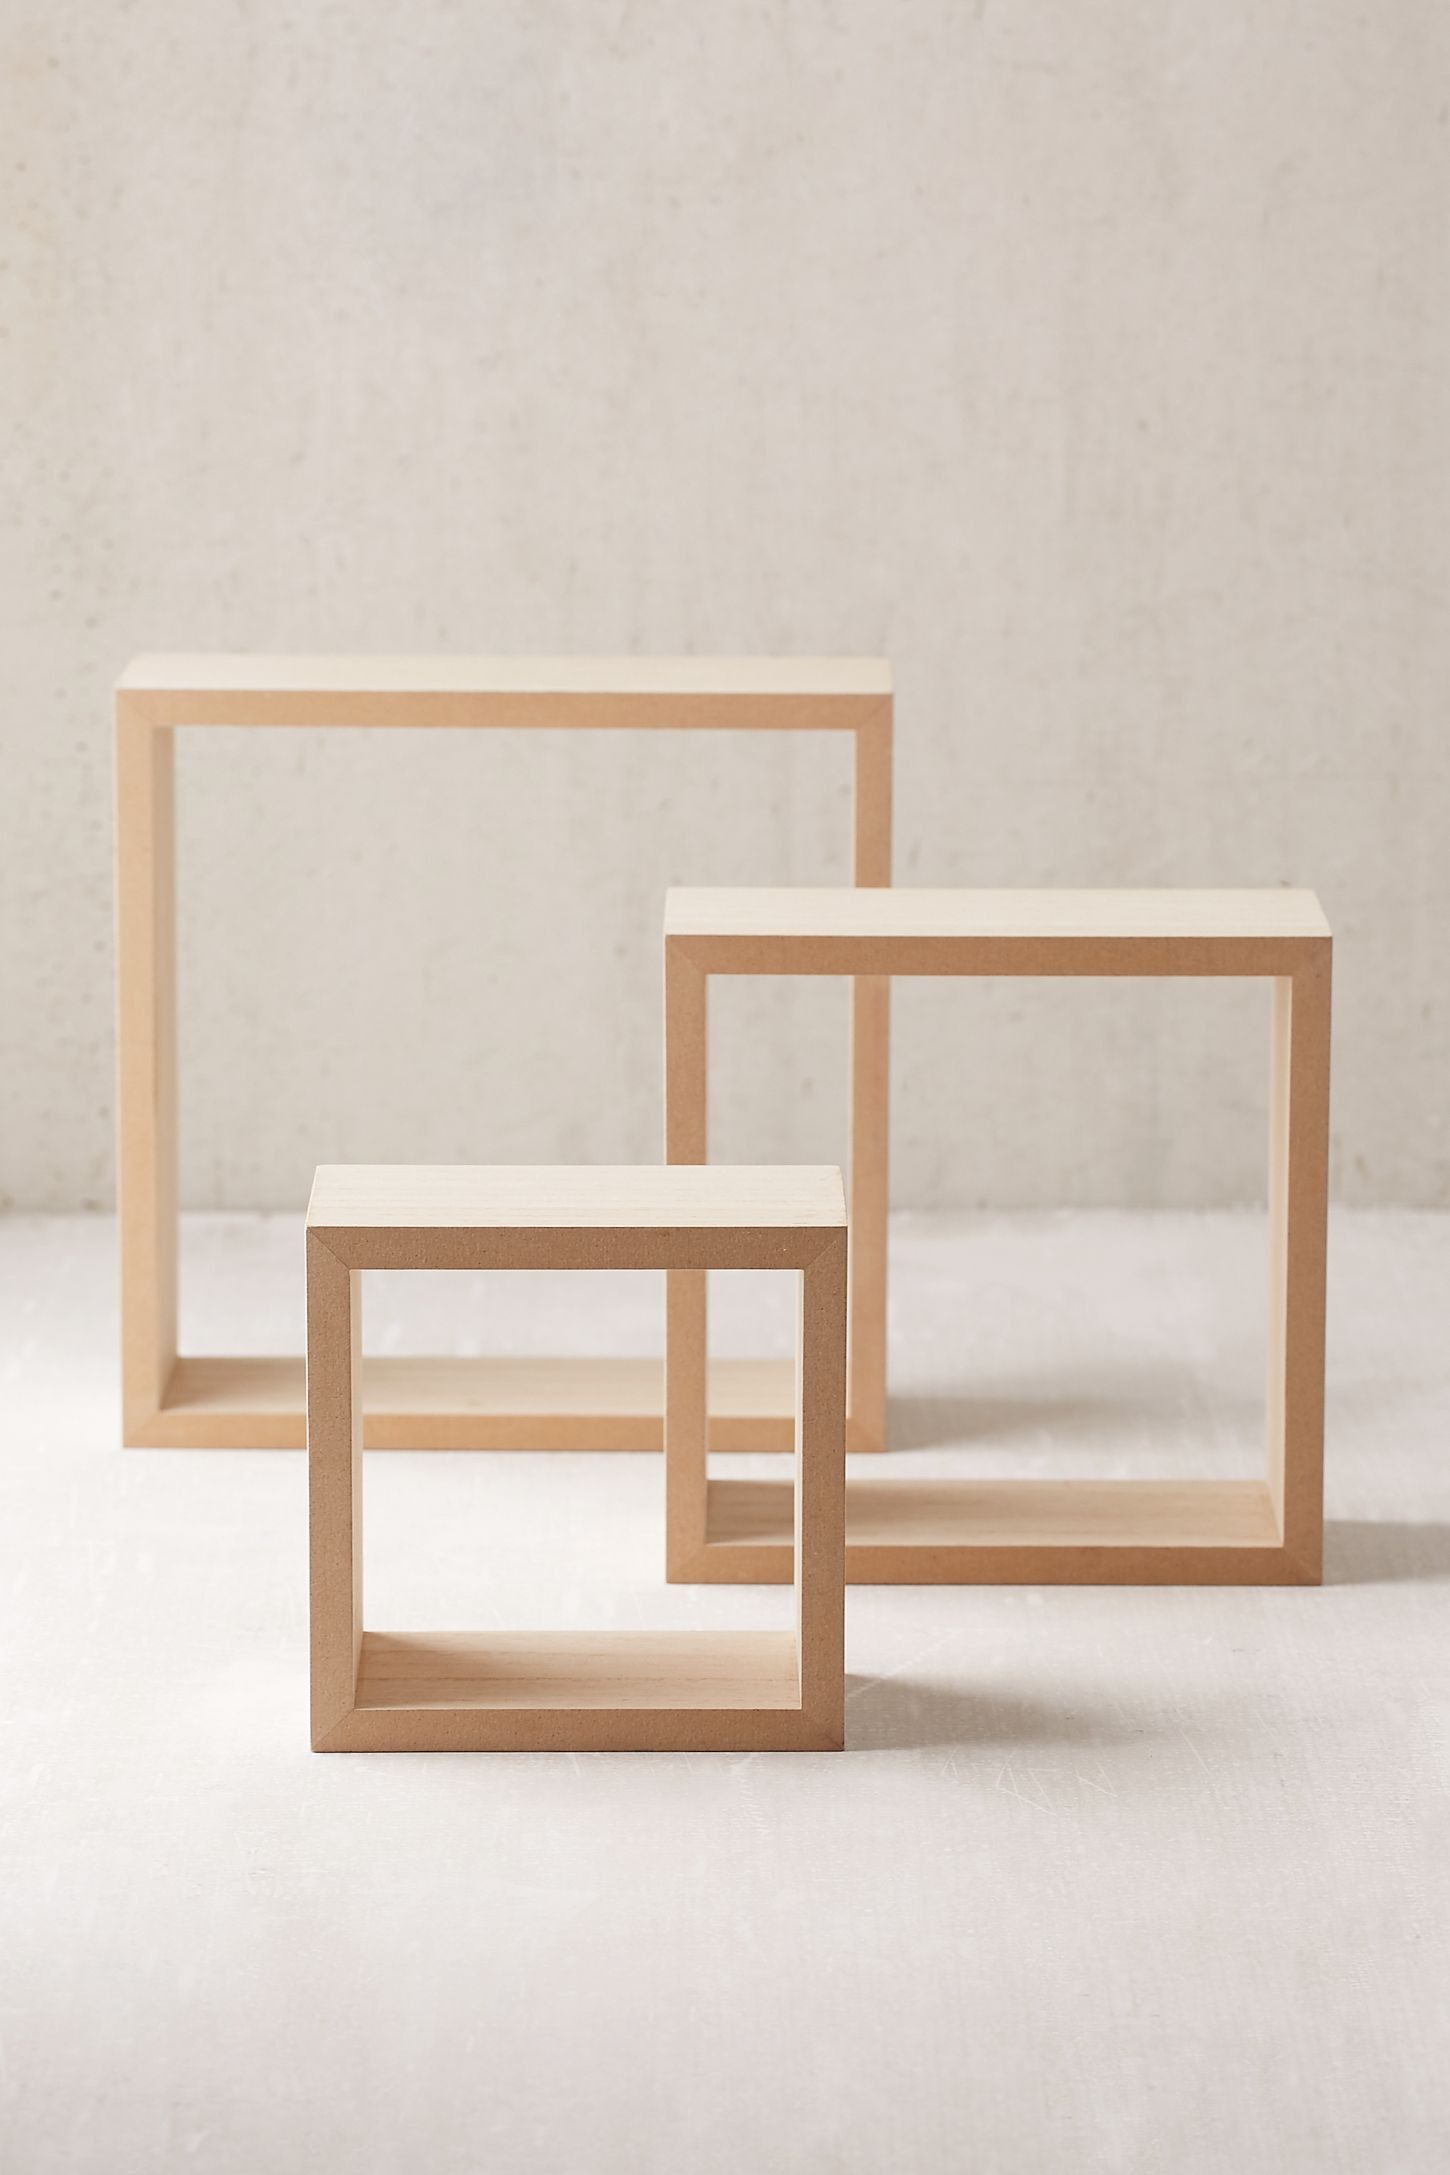 Slide View: 4: 3-Piece Square Stacking Shelf Set